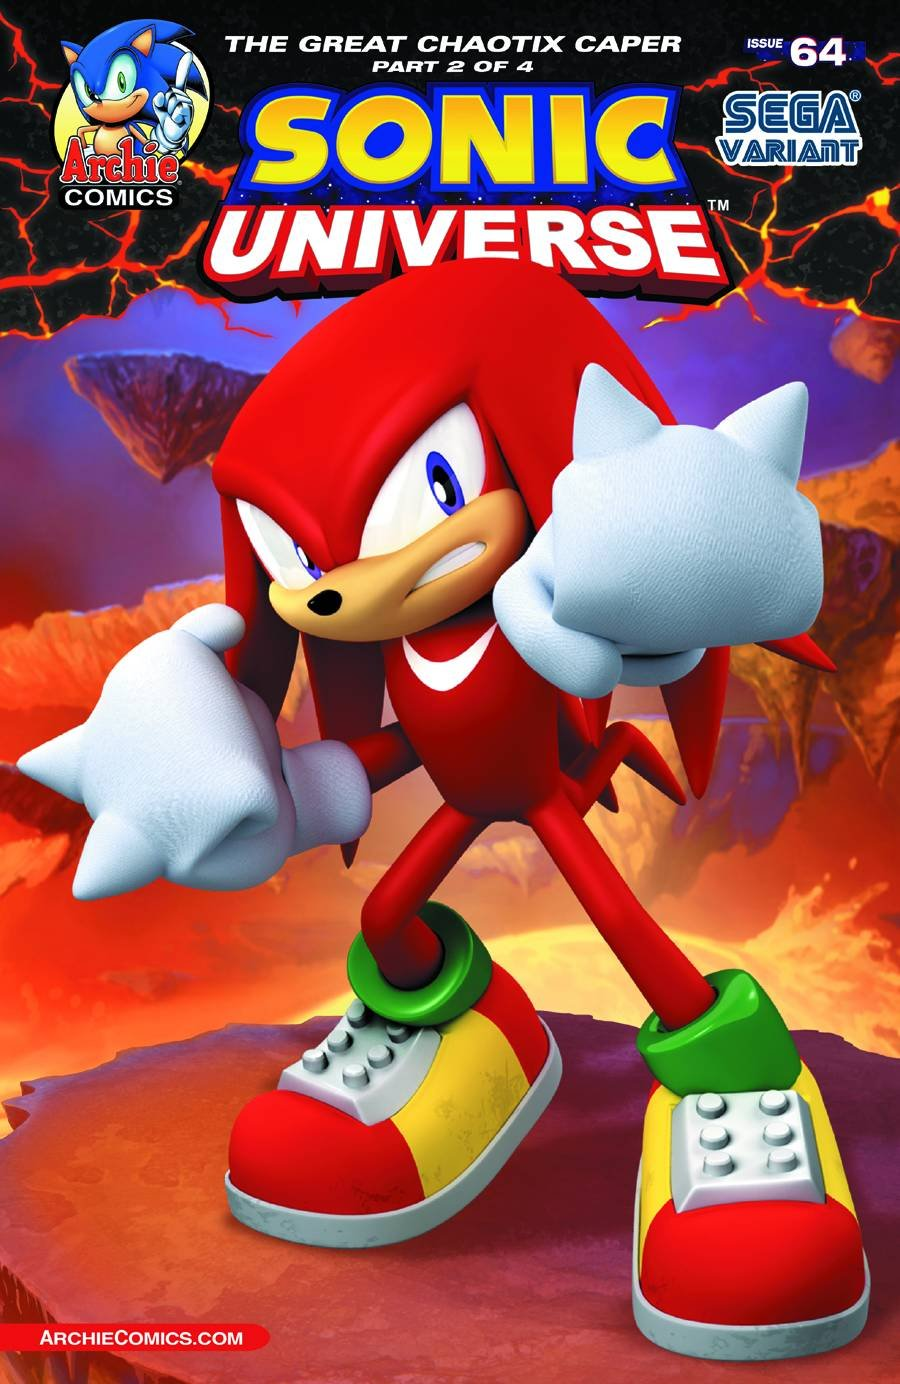 Sonic Universe 064 (July 2014) (Sega variant)